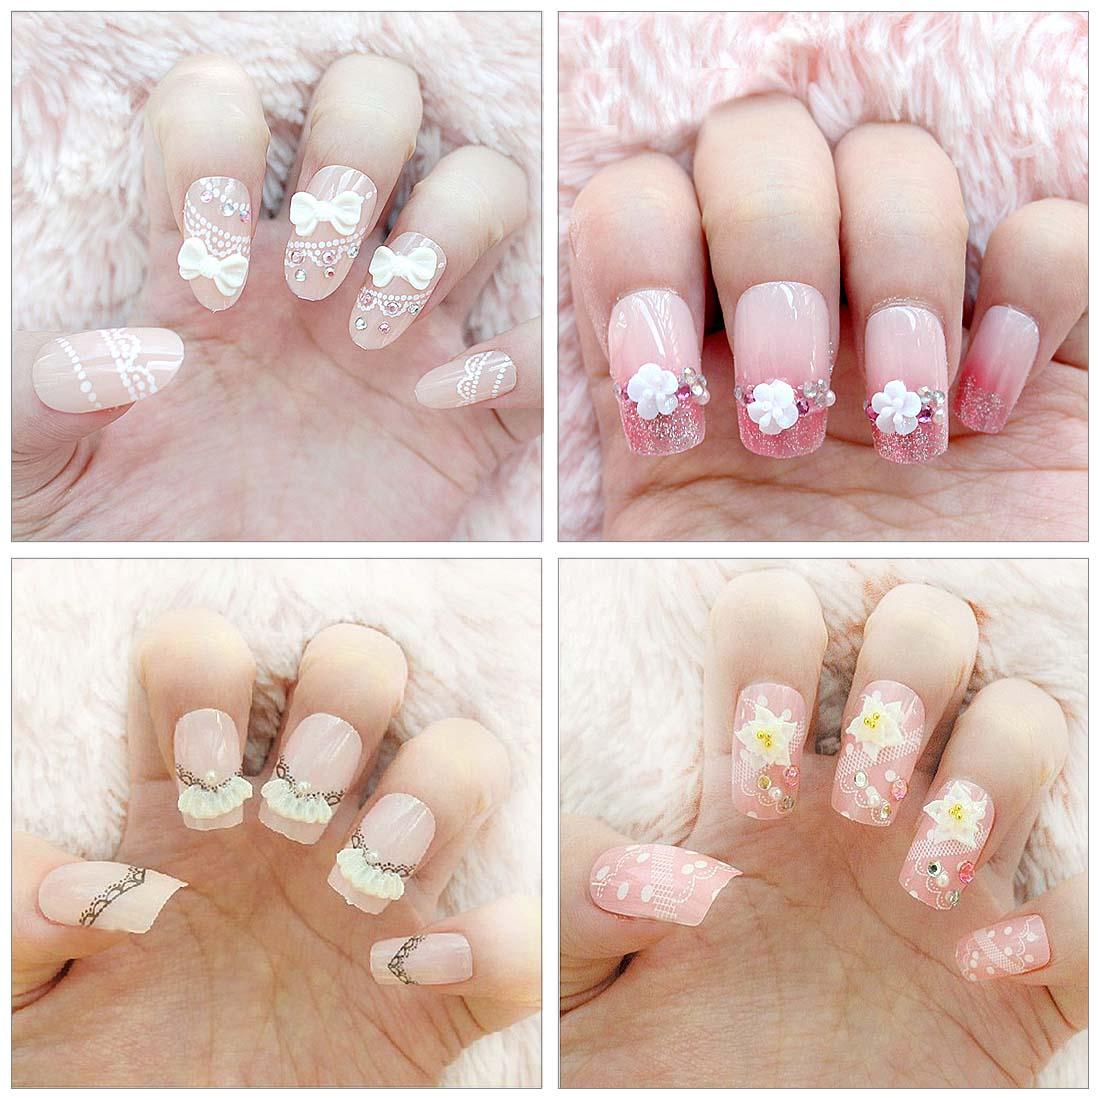 Bmc 10pc or 30pc mix design diy 3d silicone nail art for 3d acrylic nail art mold diy decoration